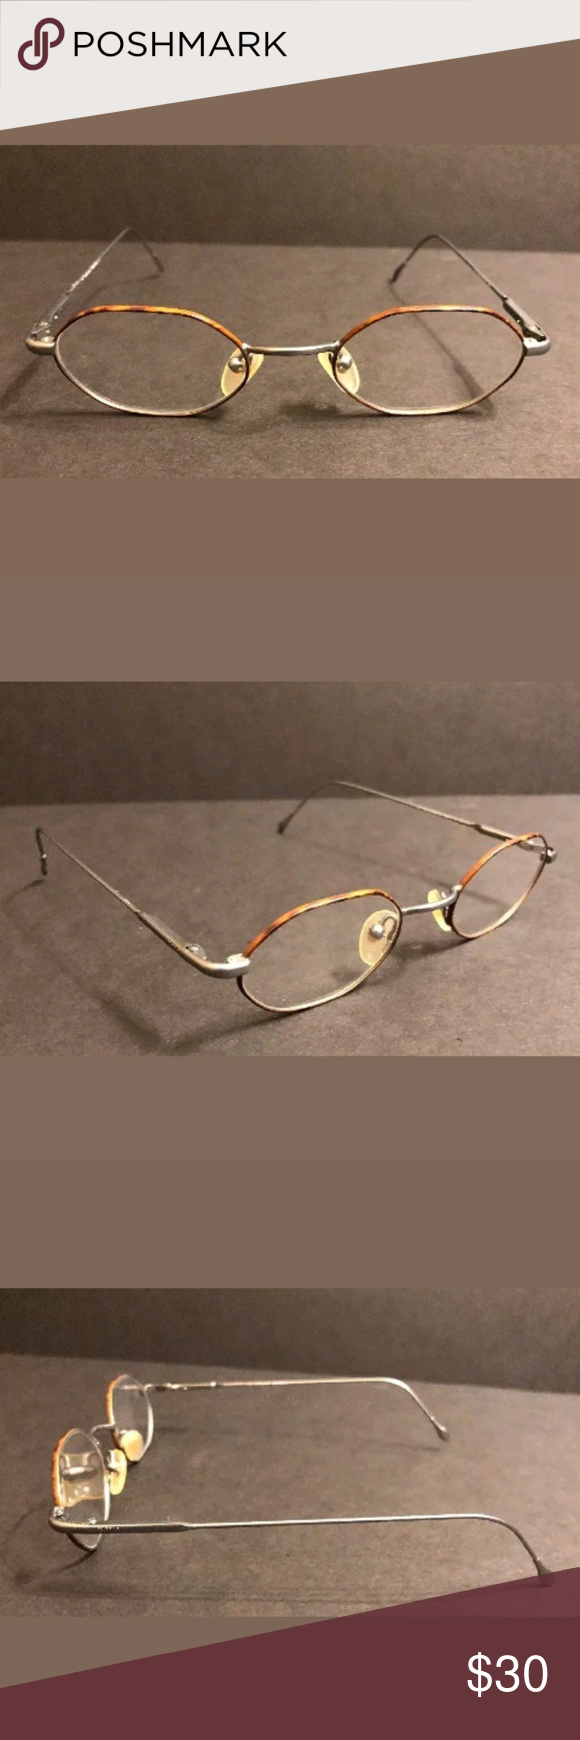 86582365bb02 Polo Ralph Lauren Classic 235 Gunmetal Eyeglasses Polo Ralph Lauren Classic  235 Gunmetal Tortoise Eyeglasses 45